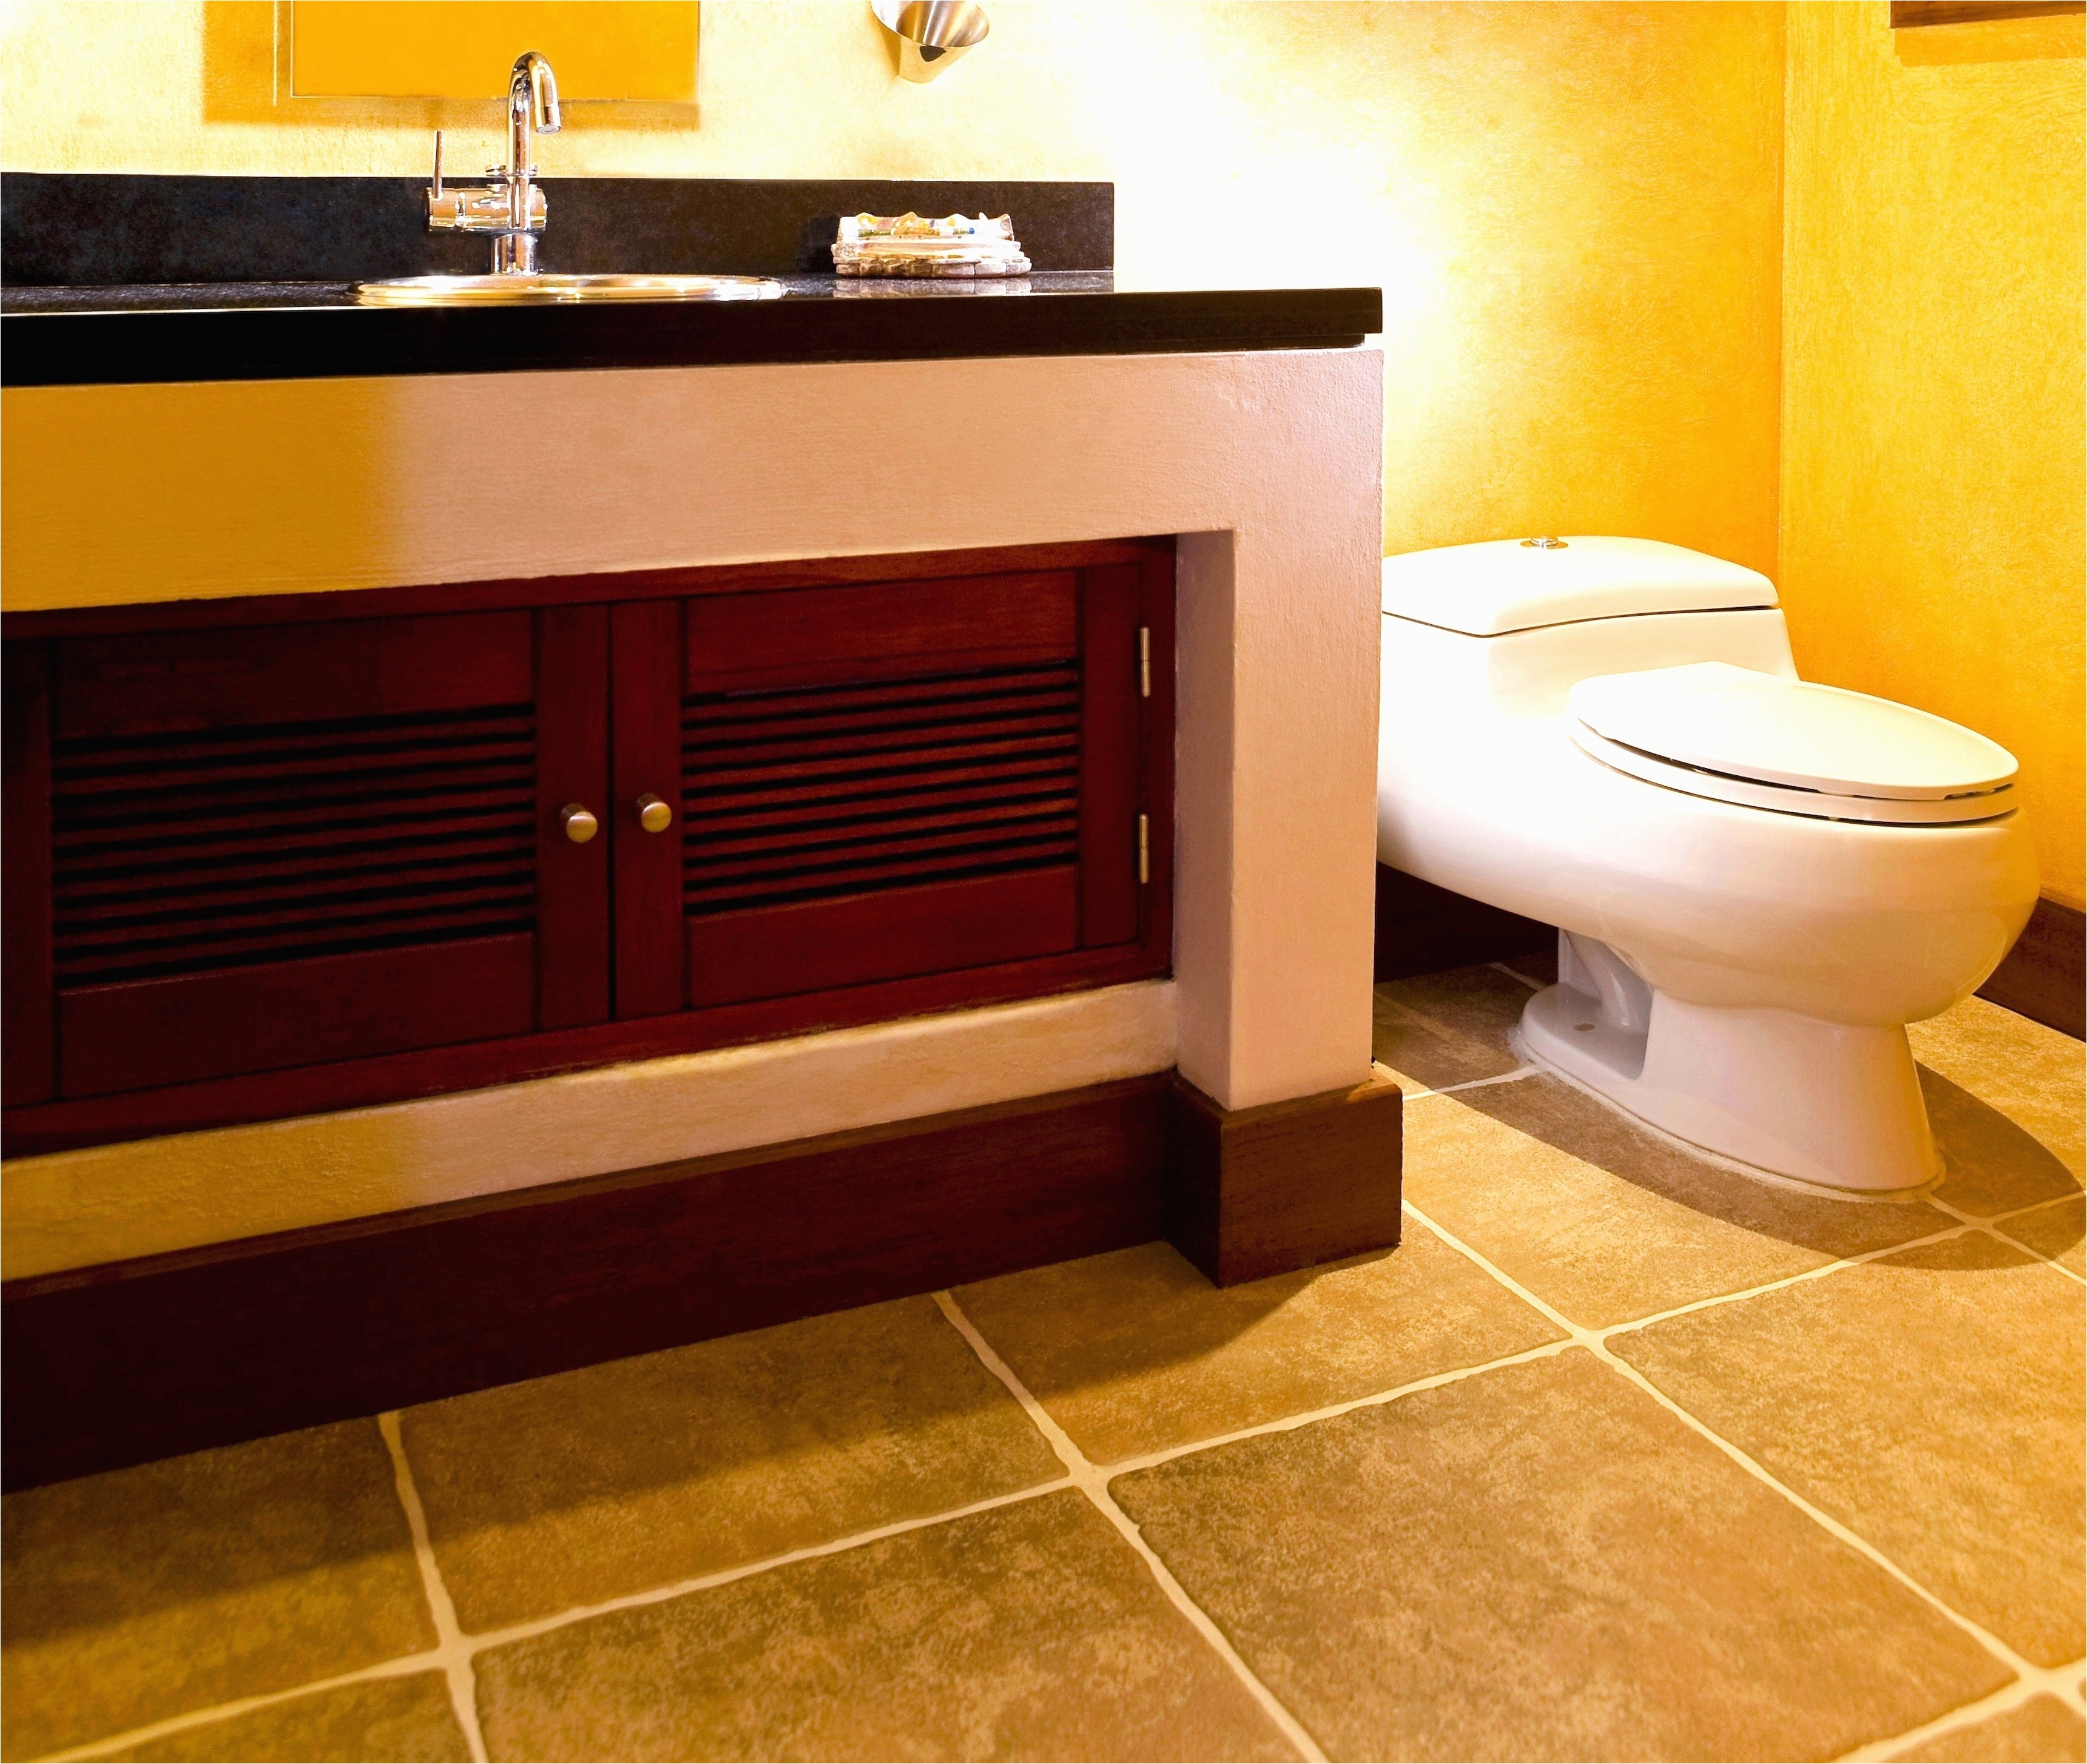 bathroom tiles pictures for small bathroom new home decor tile best floor tiles mosaic bathroom 0d